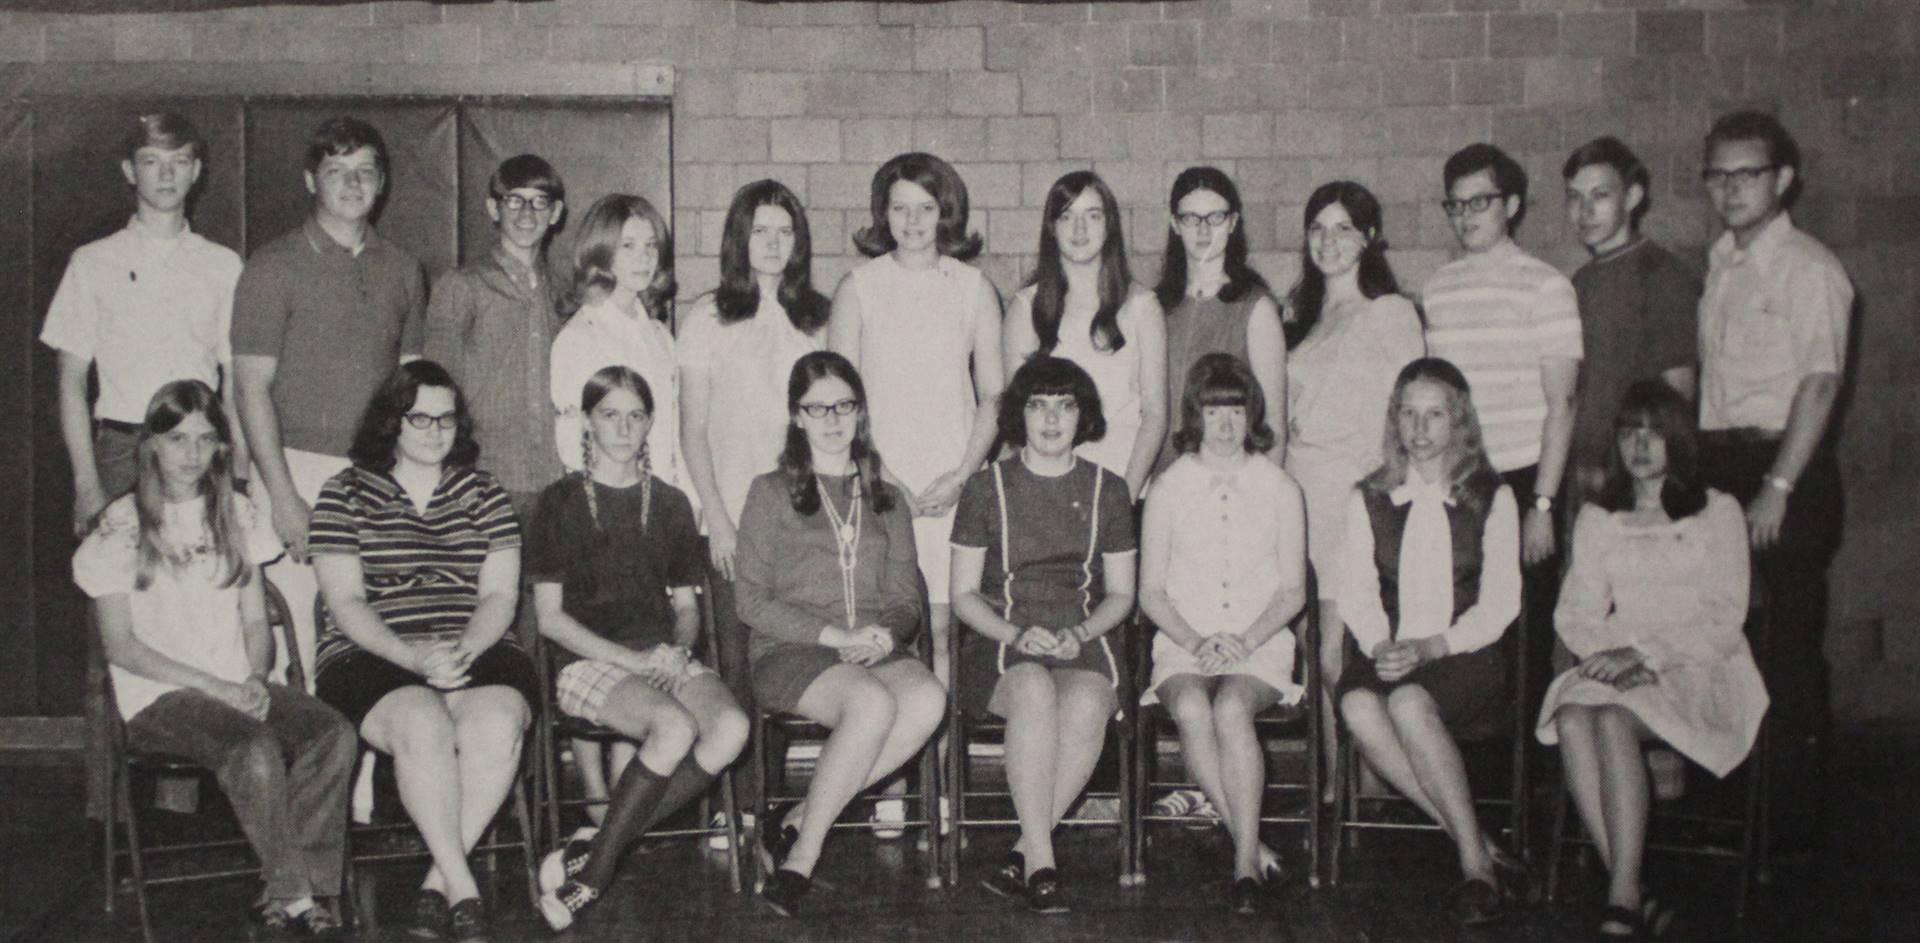 1971 NHS